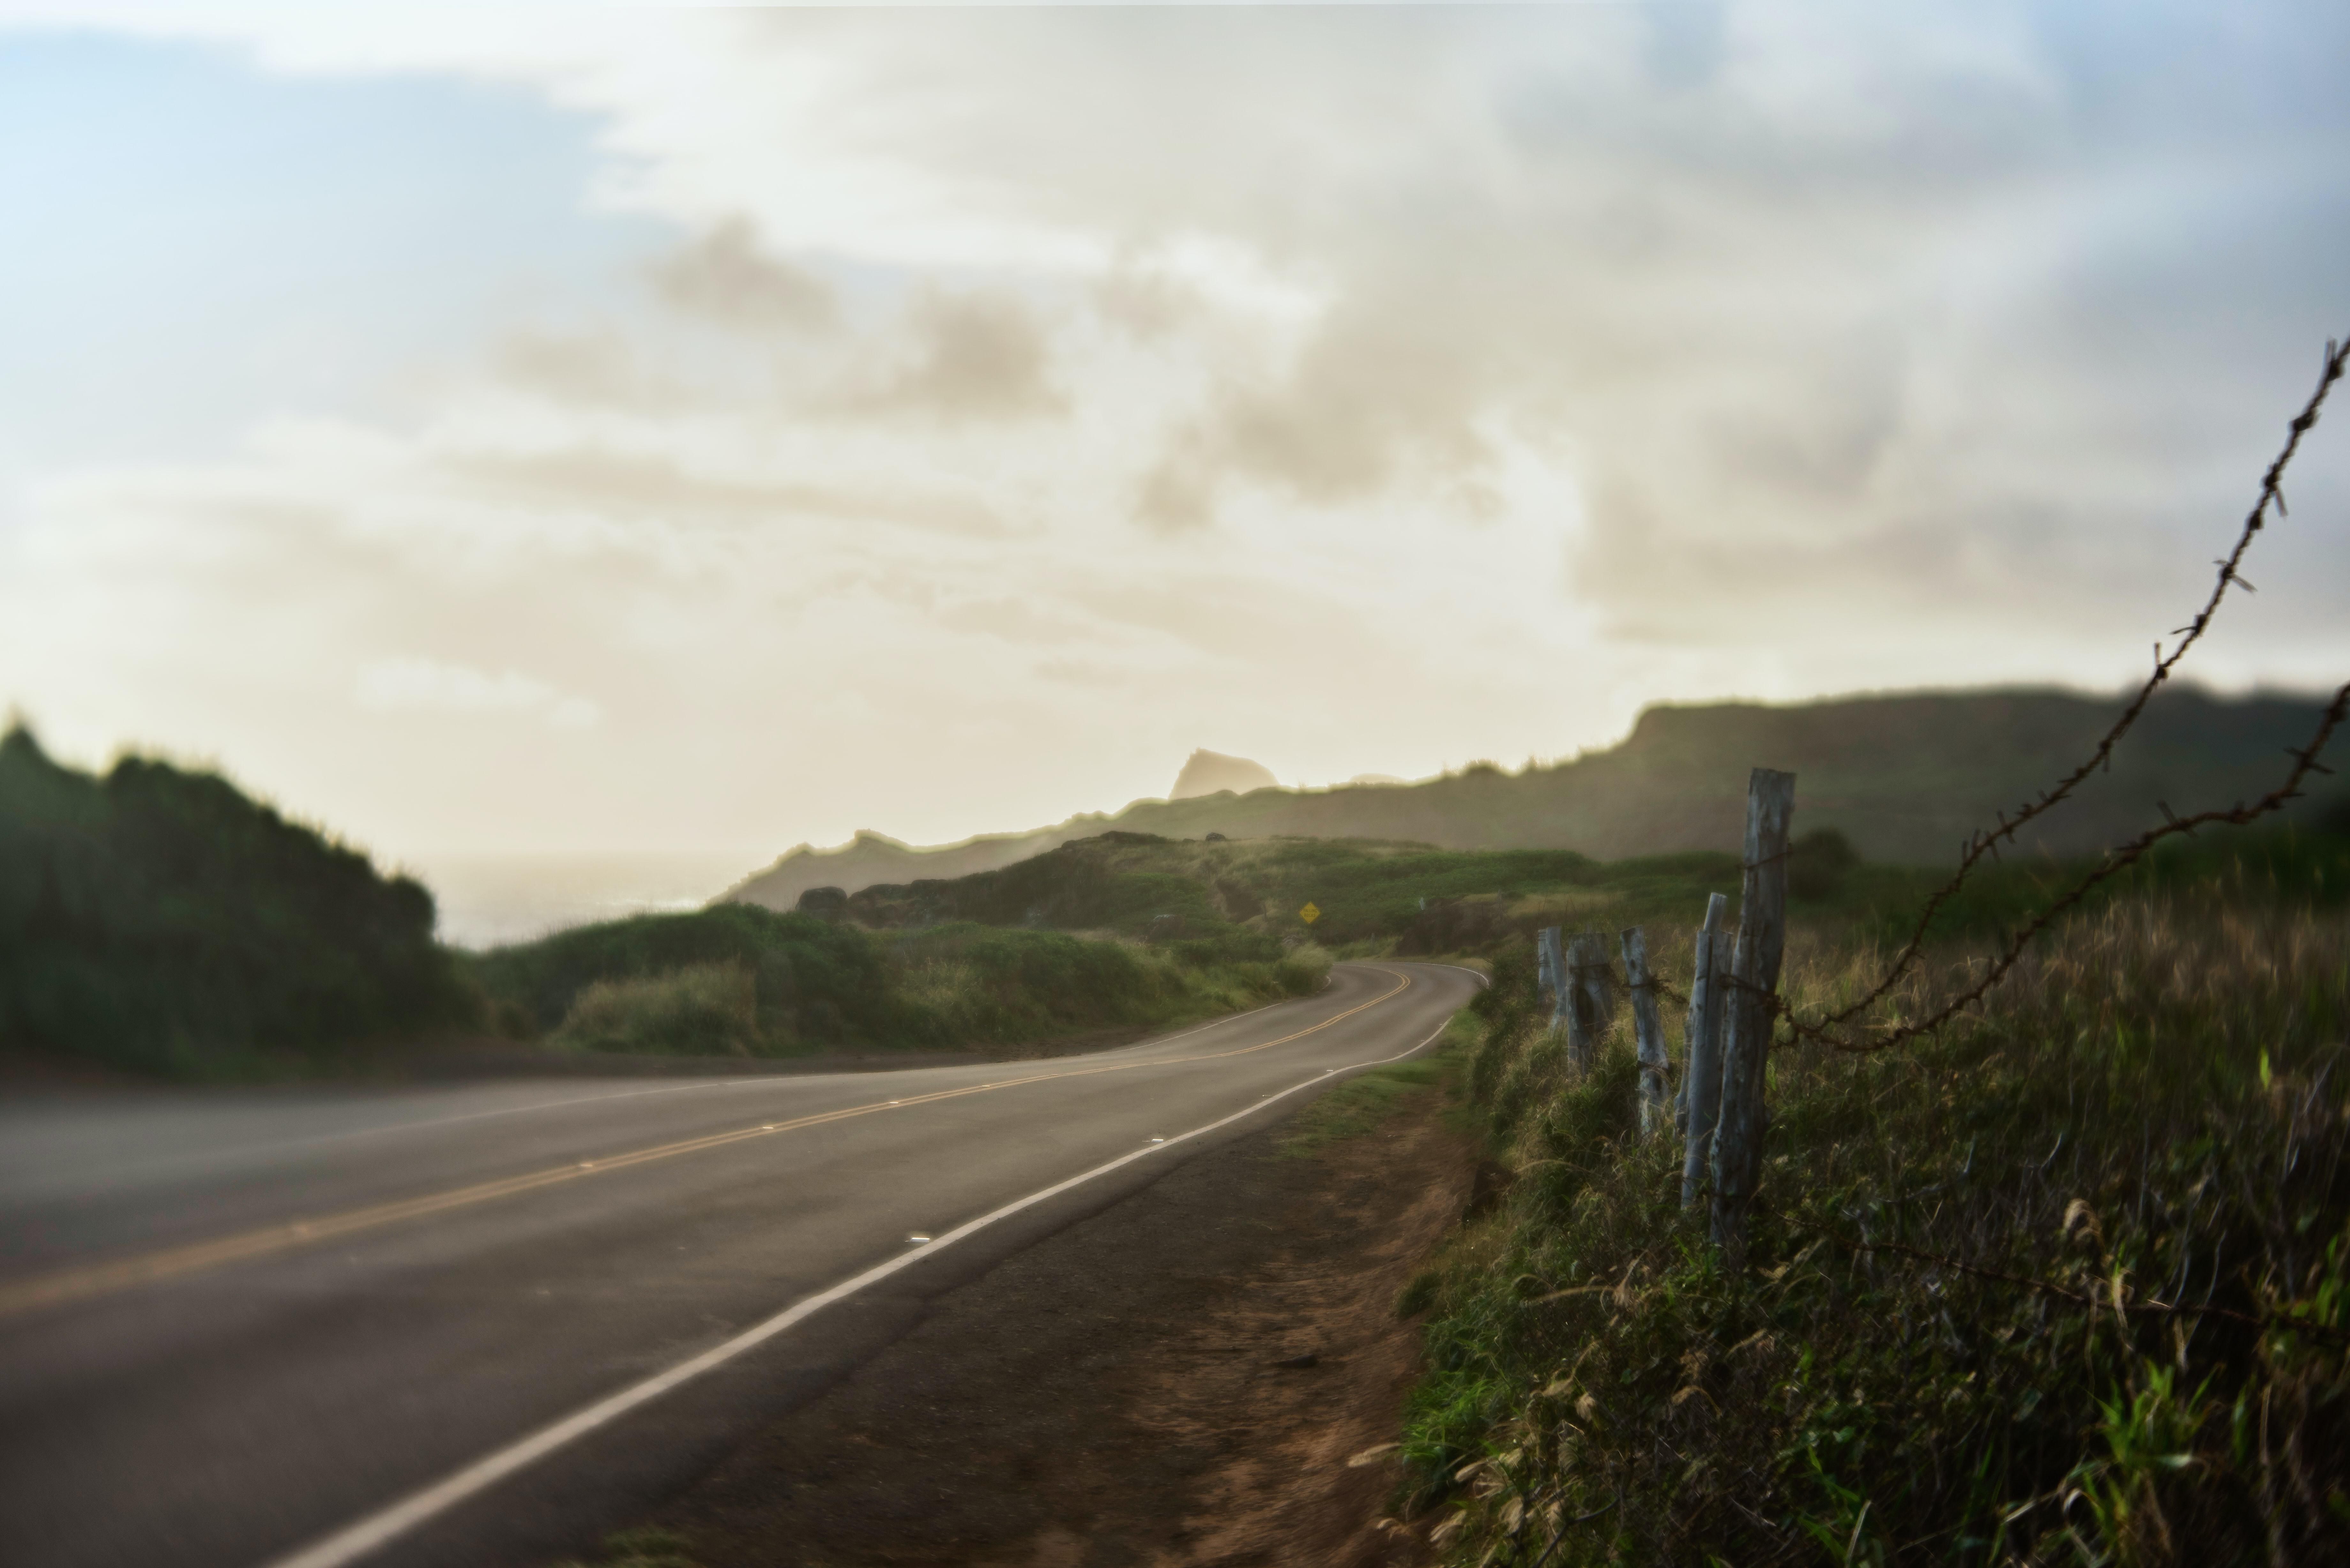 Ep17 - The road ahead in Genetics and Genomics